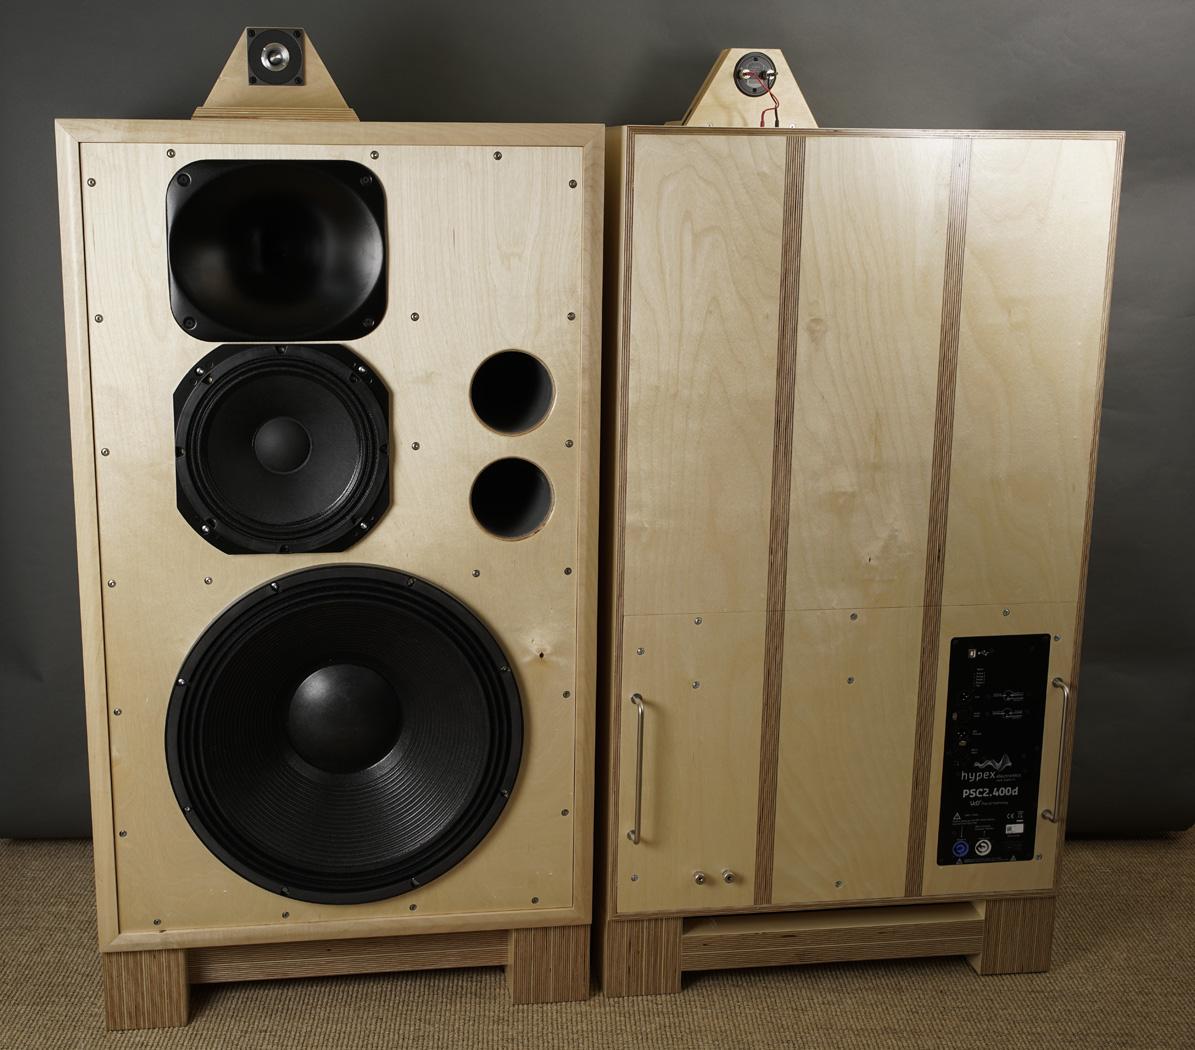 The Loudspeaker Way Speaker Crossover Work Also Jbl Speakers 3 Diagrams Click Image To View Large